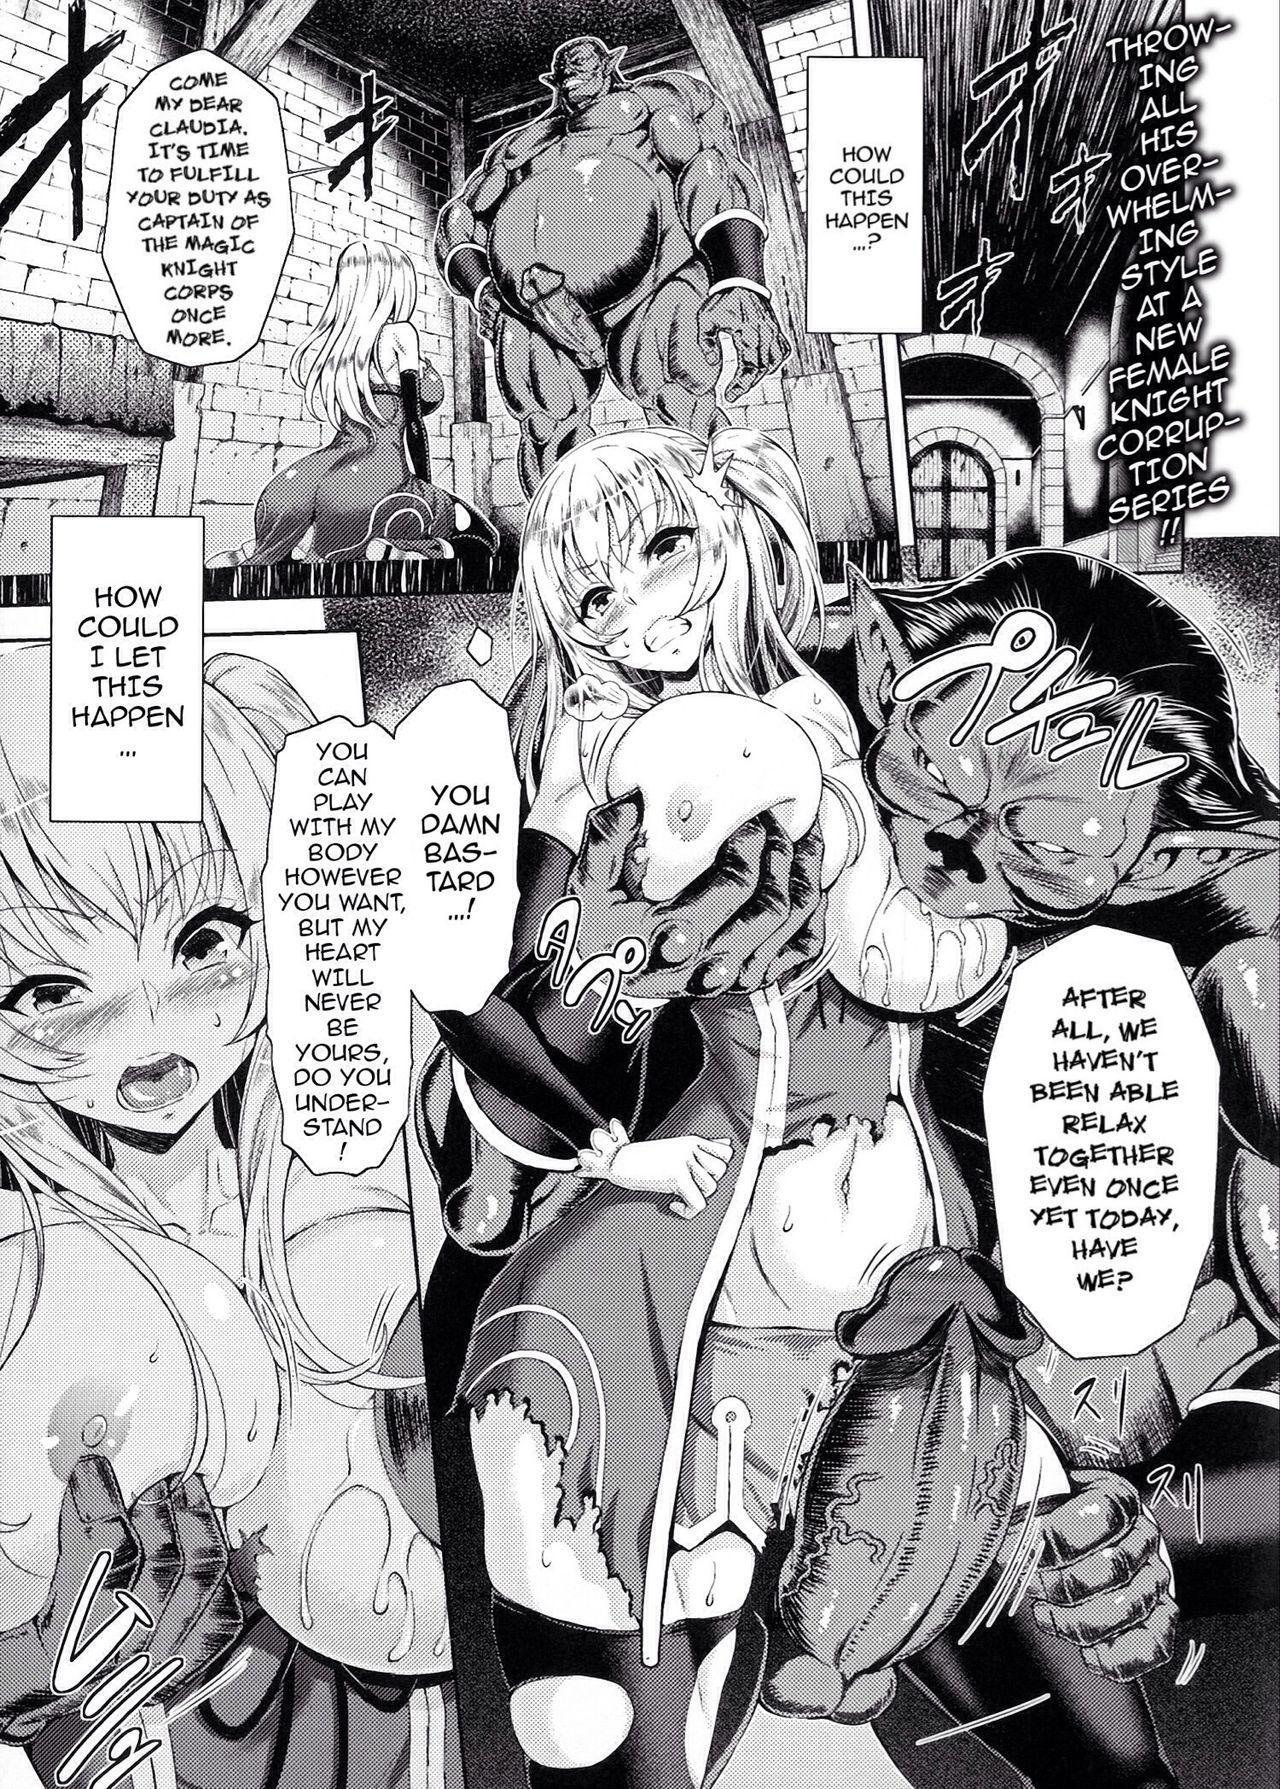 [Yamada Gogogo] Erona ~Orc no Inmon ni Okasareta Onna Kishi no Matsuro~ | Erona ~The Fall of a Beautiful Knight Cursed with the Lewd Mark of an Orc~ Ch. 1-6 [English] [darknight] [Decensored] [ongoing] 0